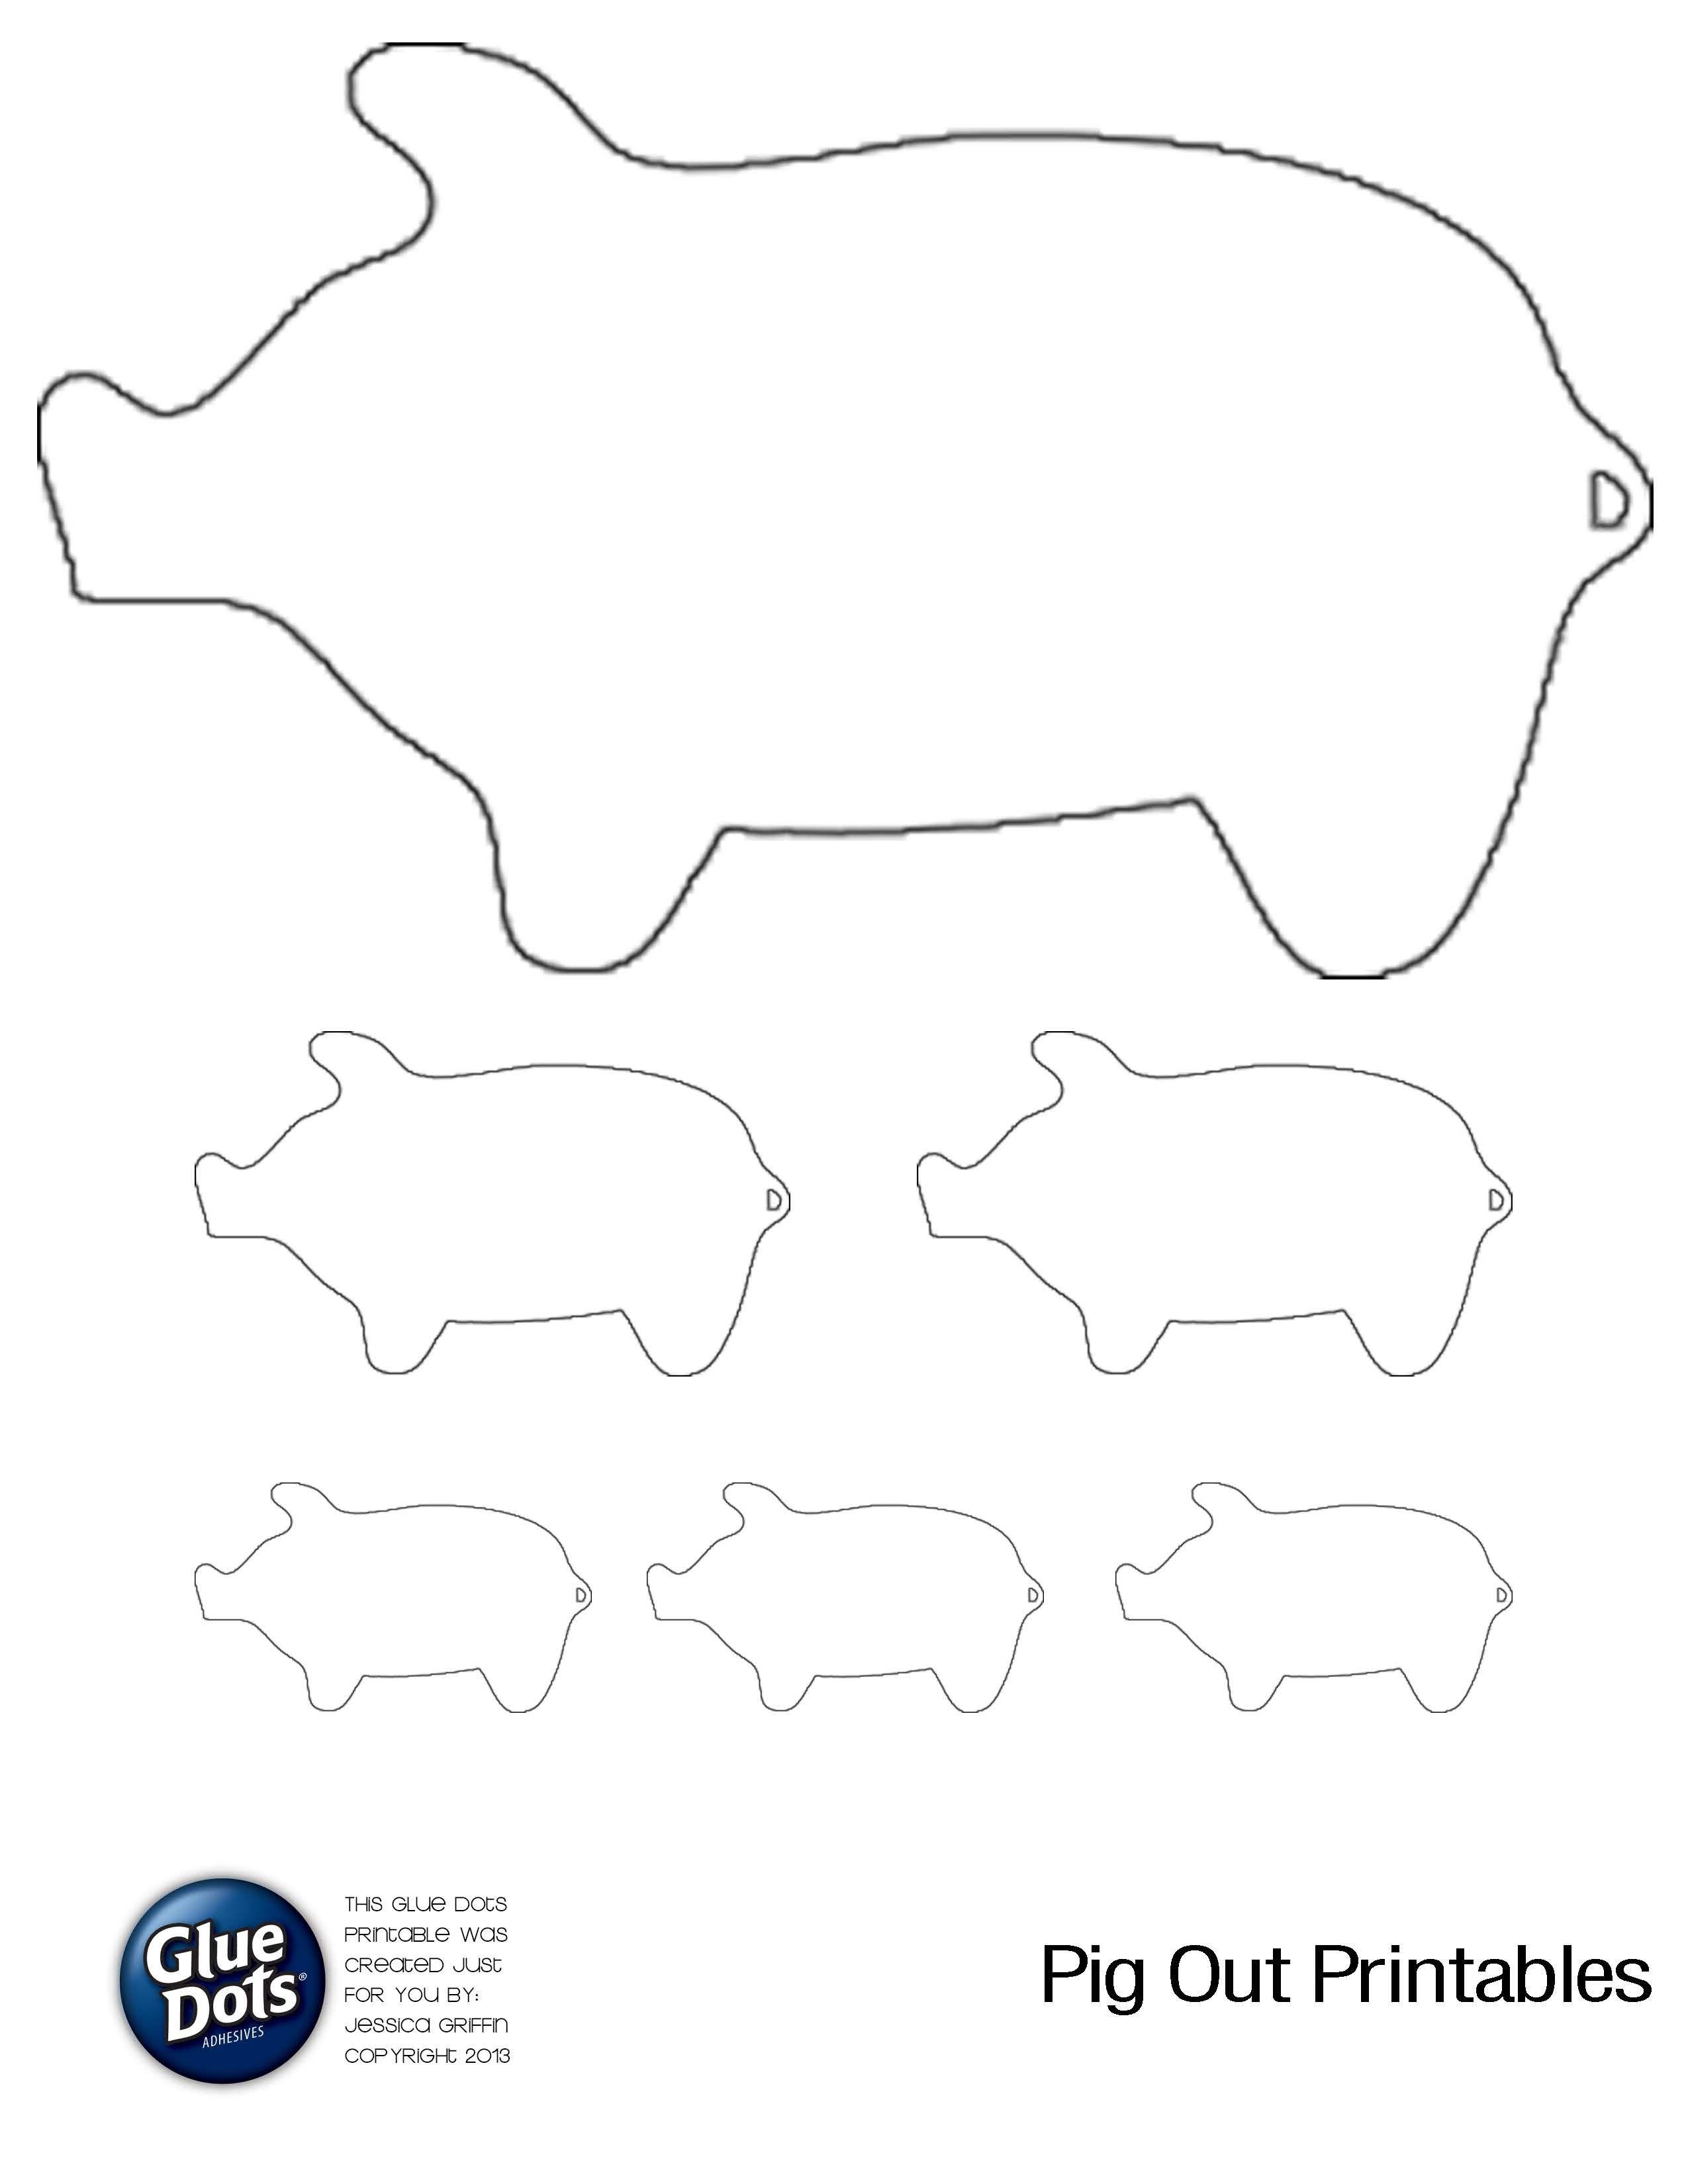 Free Pig Shape Printables For Gluedots Pig Out Summer